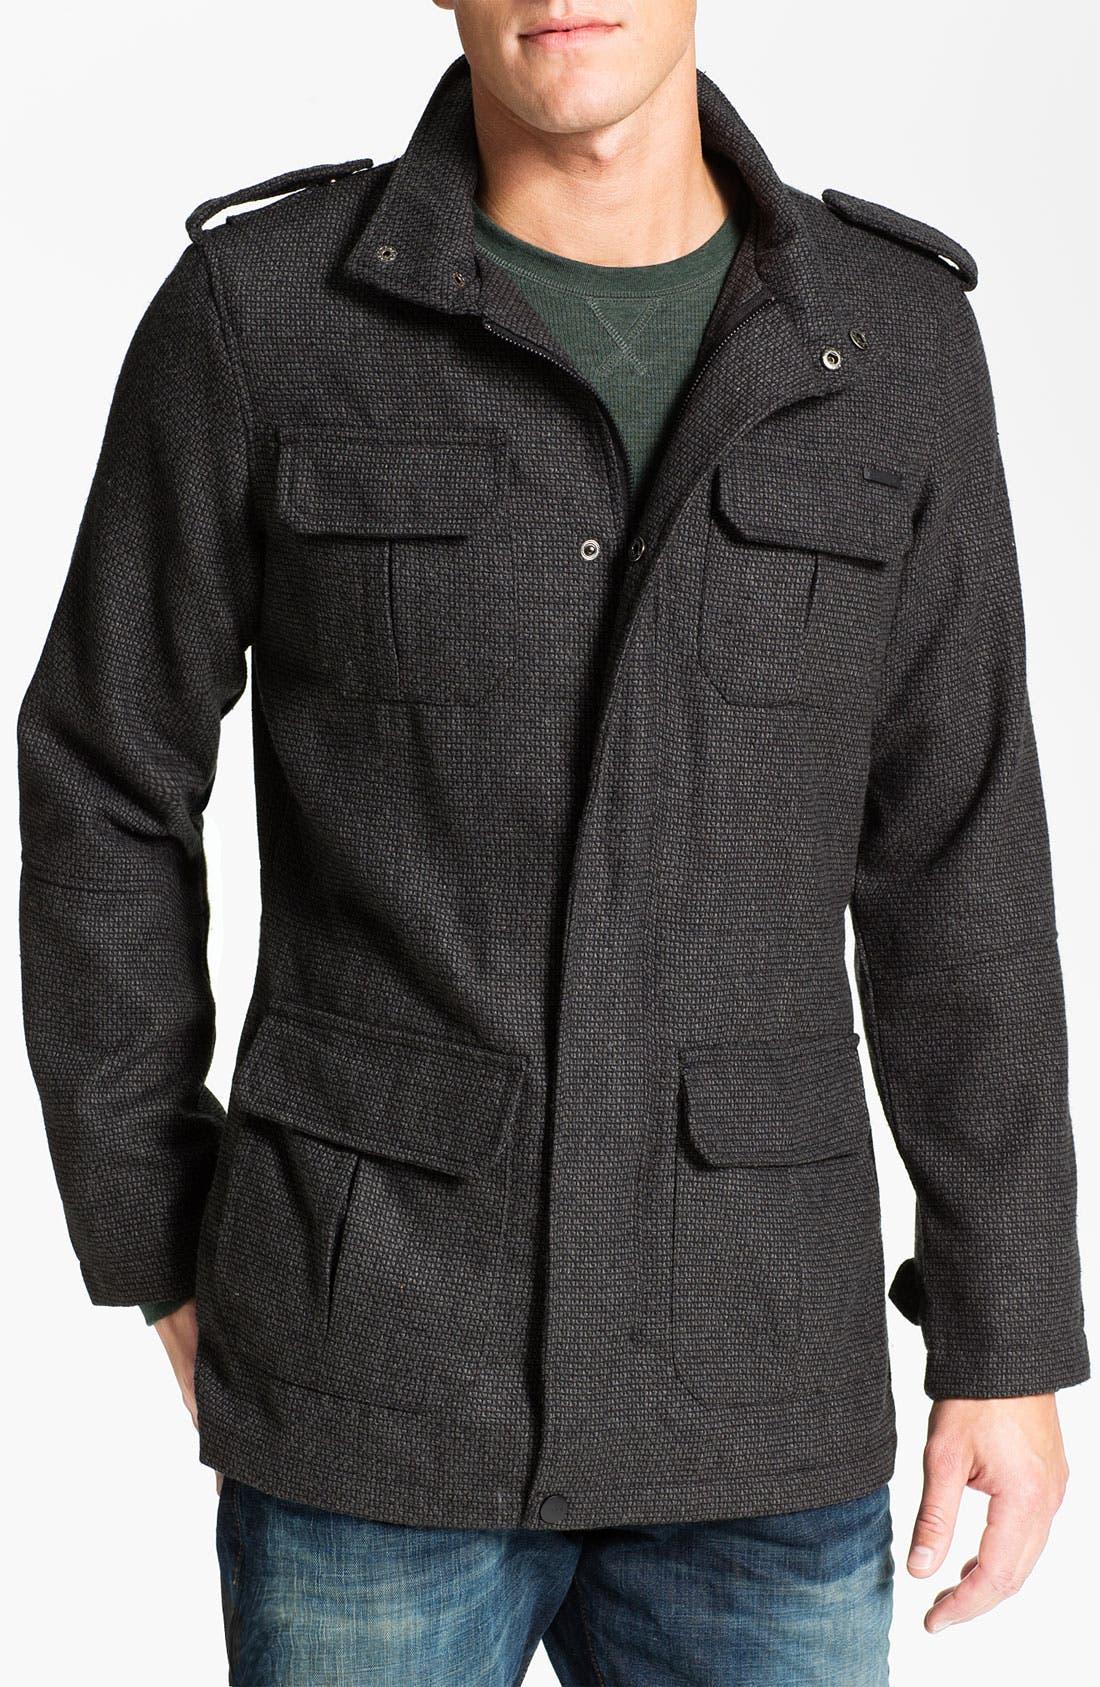 Alternate Image 1 Selected - Ezekiel 'Predator' Tweed Jacket